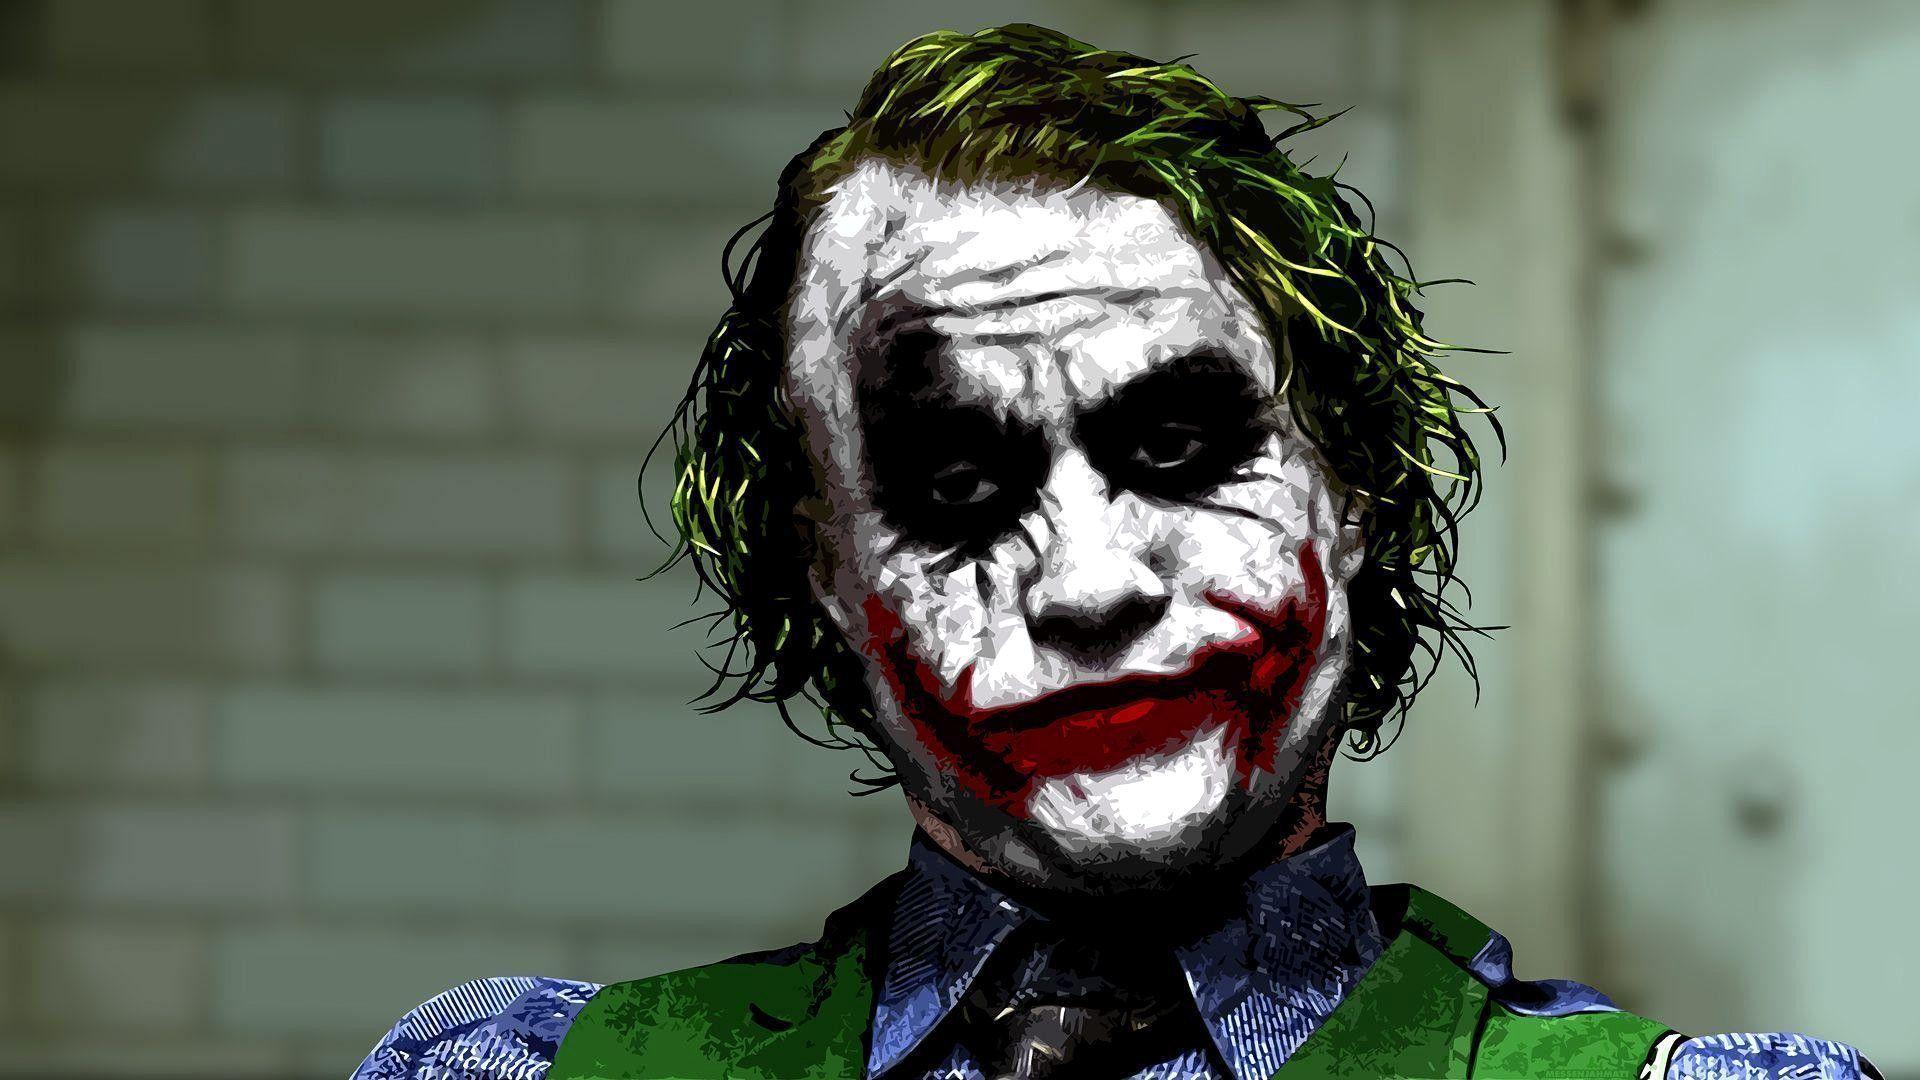 Batman Joker Card Movie Wallpapers Joker Wallpapers Joker Images Joker Hd Wallpaper